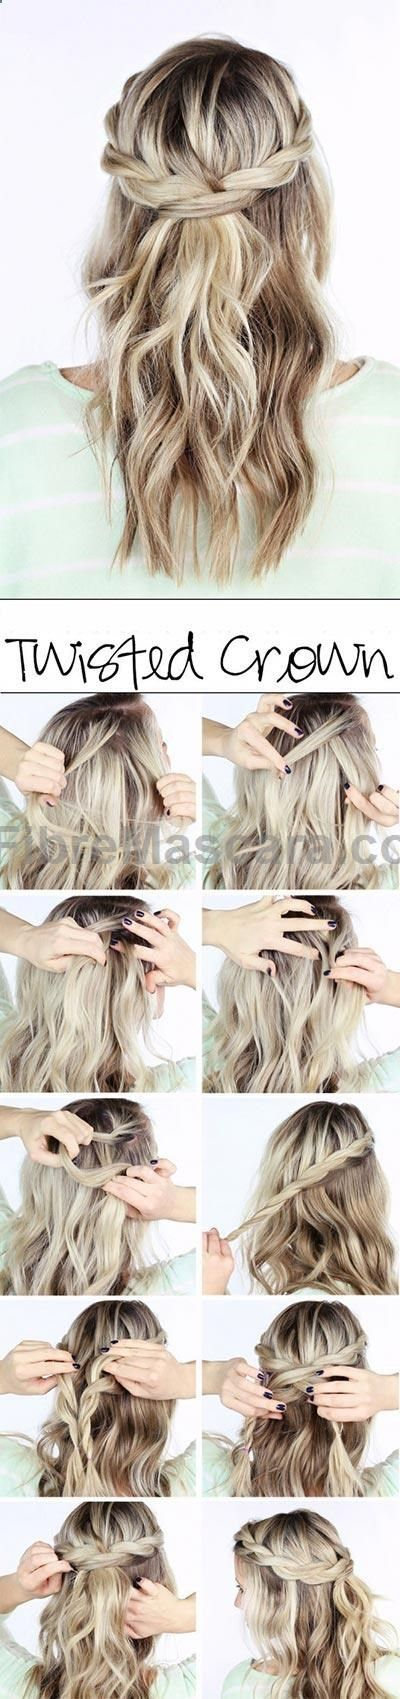 Strange 1000 Ideas About Easy Work Hairstyles On Pinterest Work Short Hairstyles For Black Women Fulllsitofus